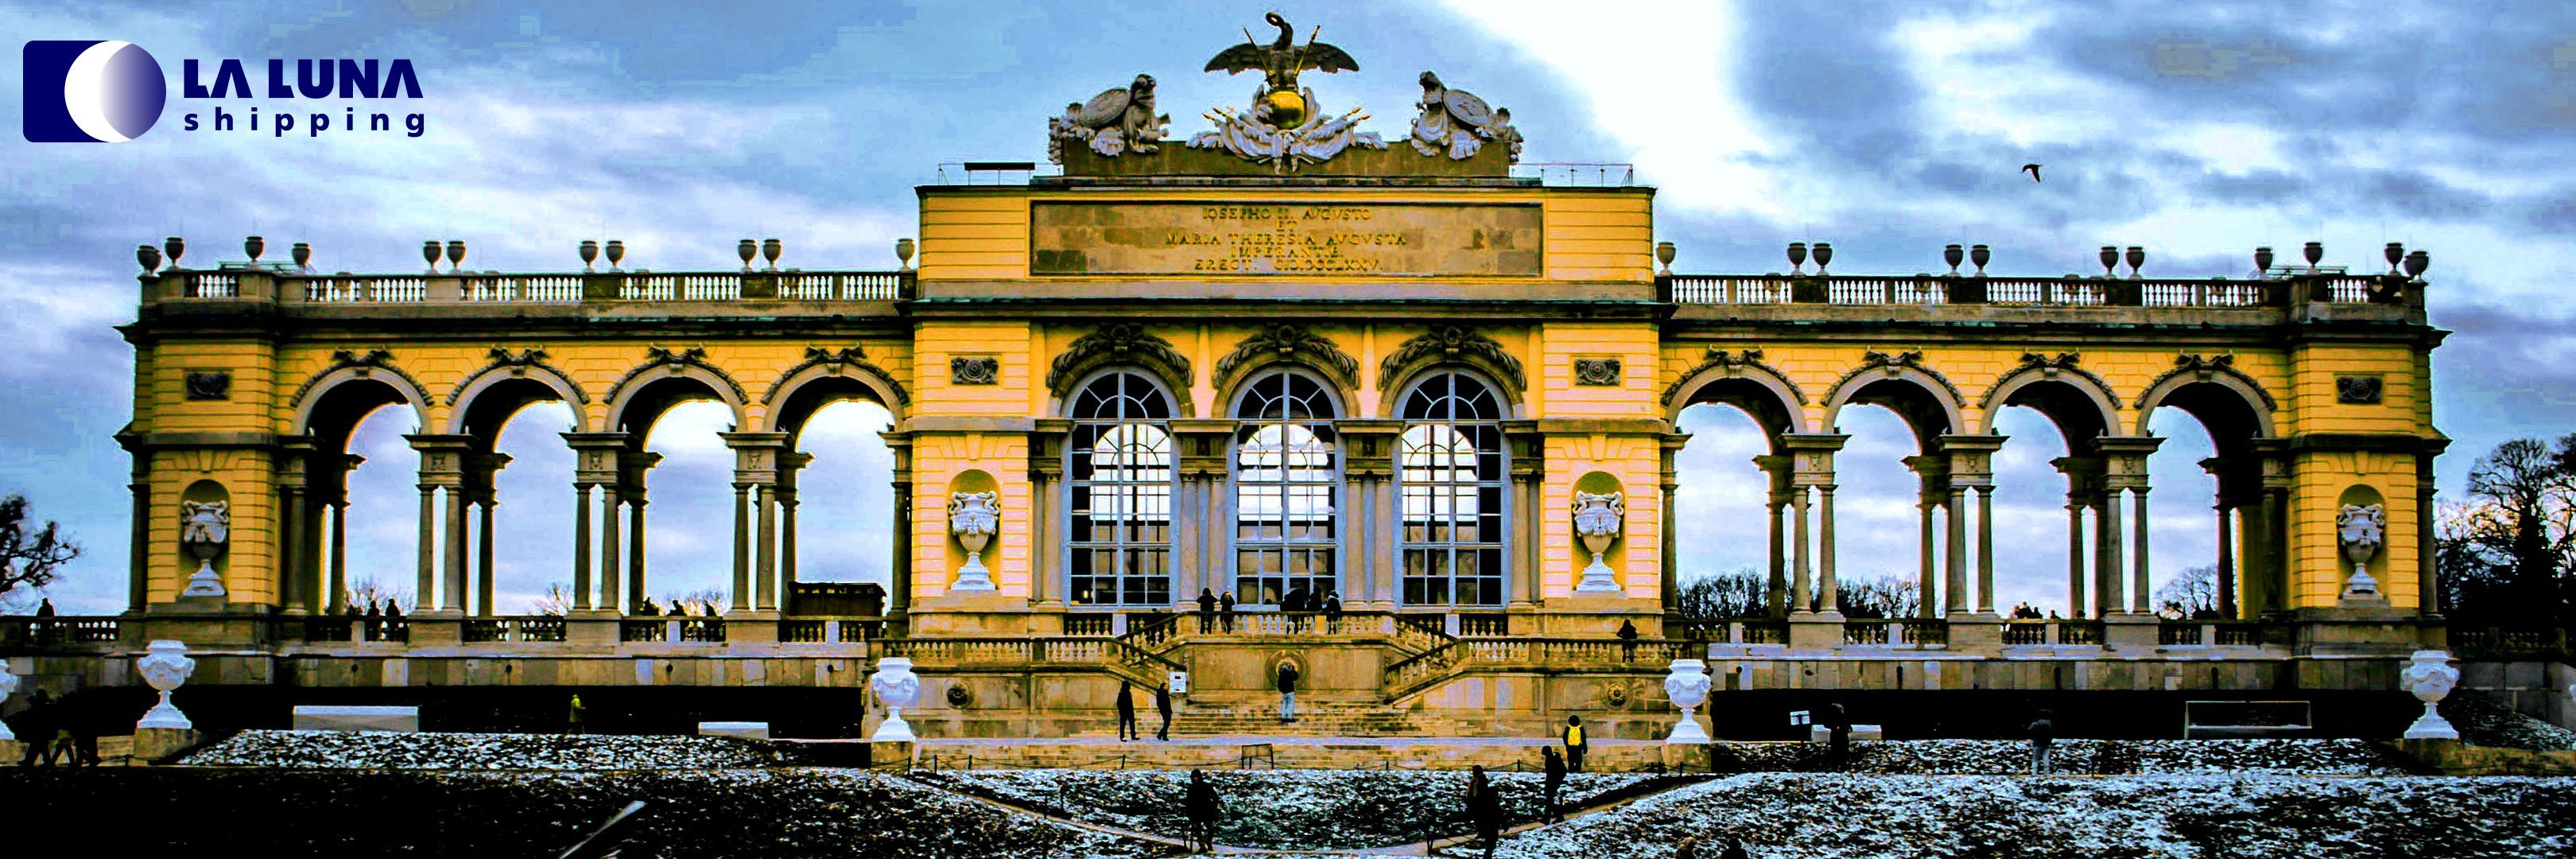 Envios_a_Austria-panorama-viena-innsbruck-paquete-documentos-efectos-personales-export-import-carga-mercancia